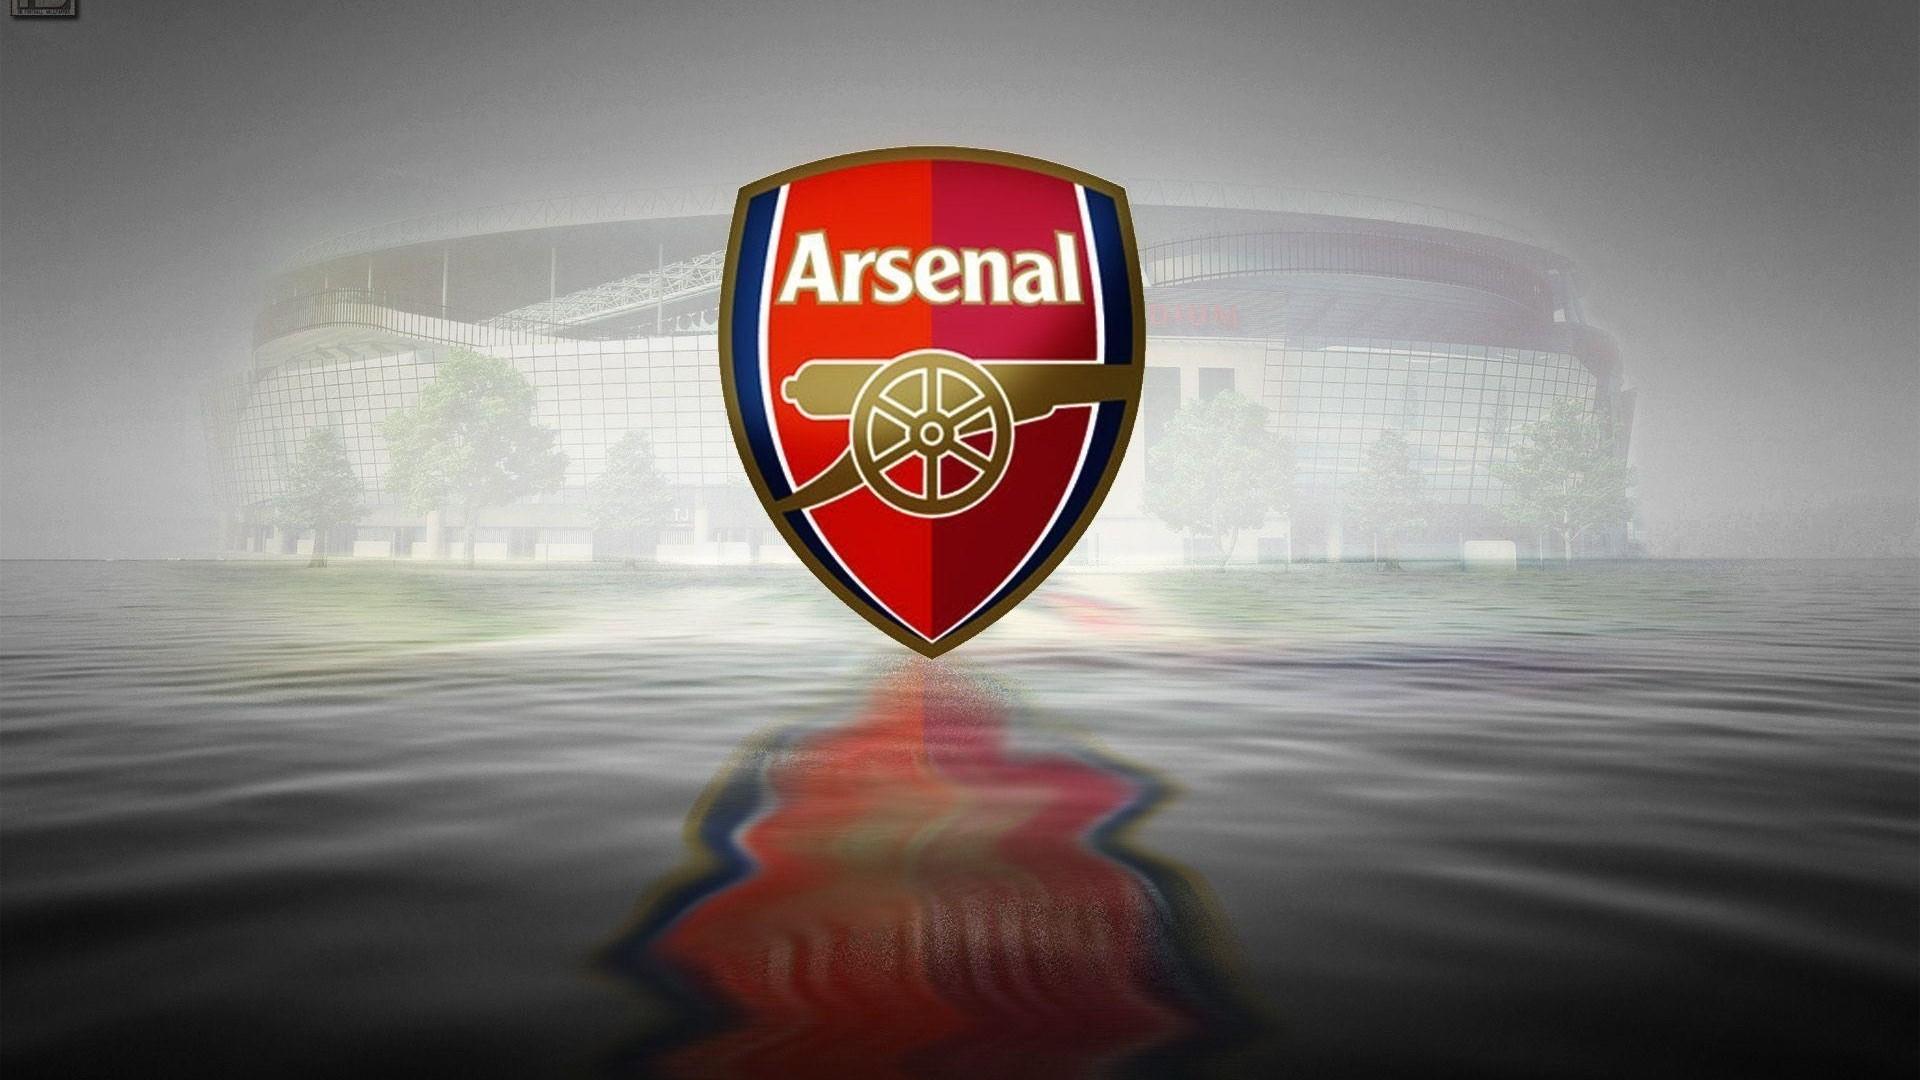 Arsenal Free Wallpaper